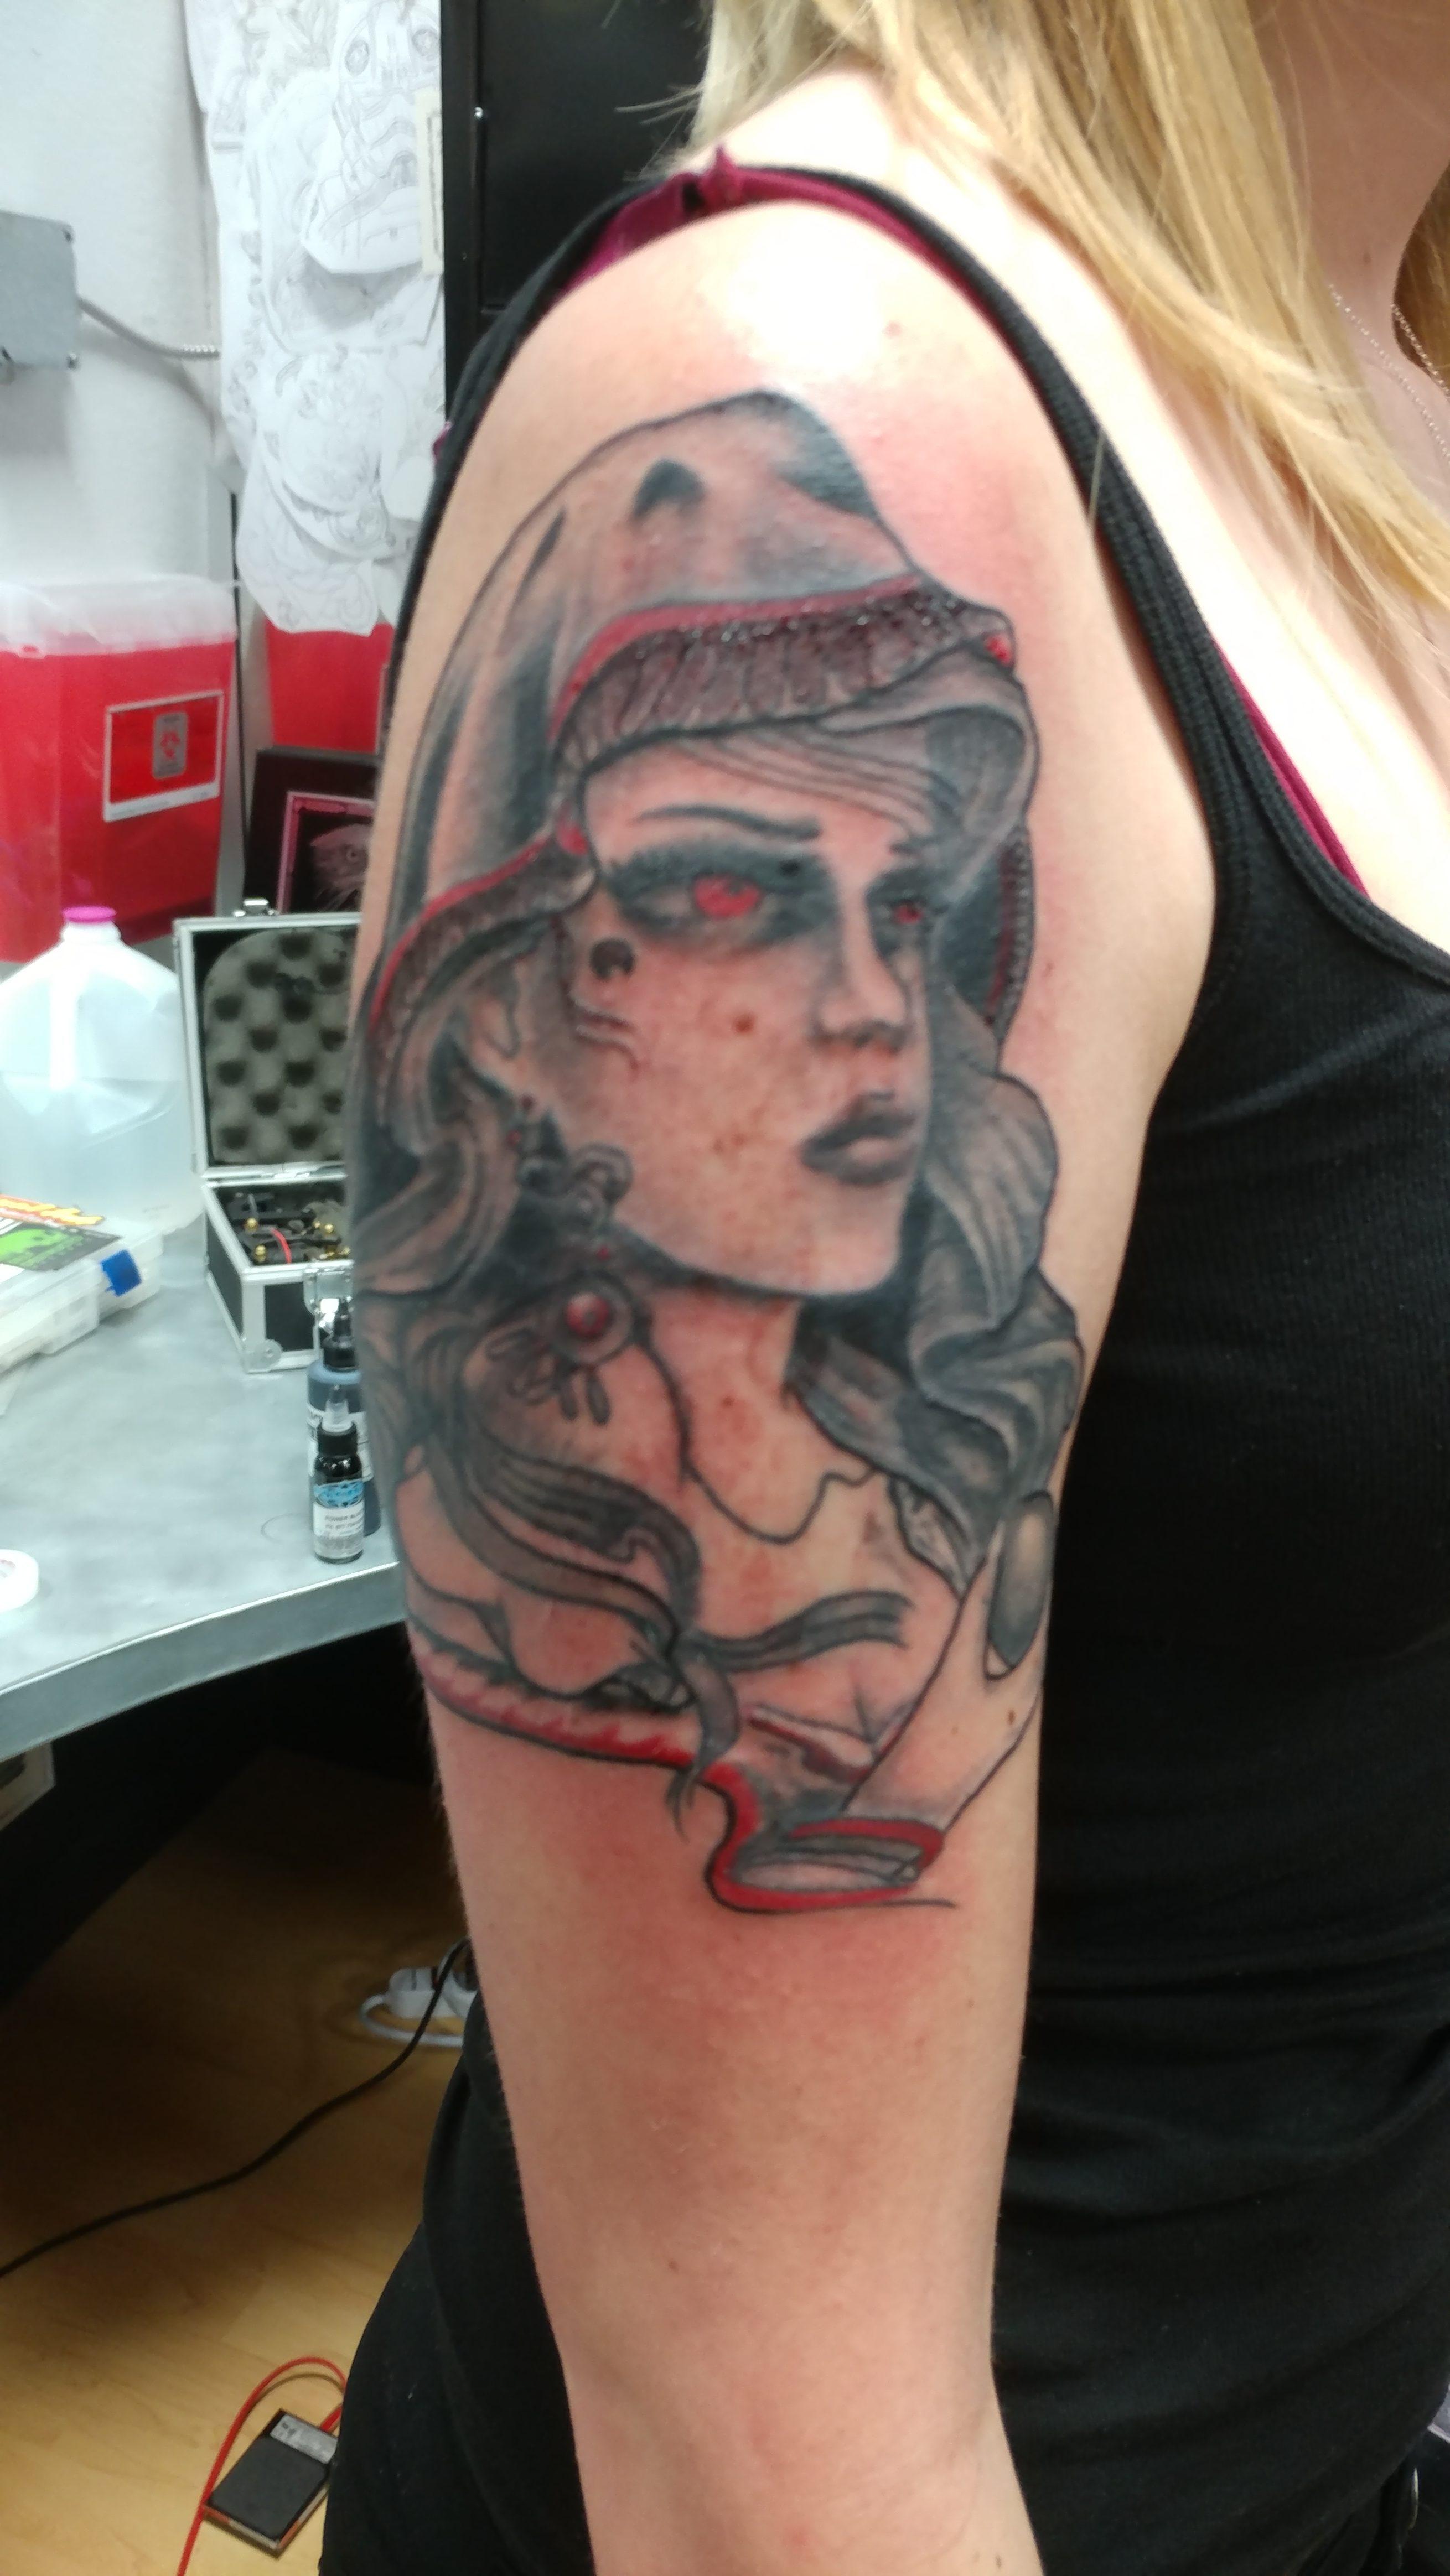 Millenium tattoo greeley